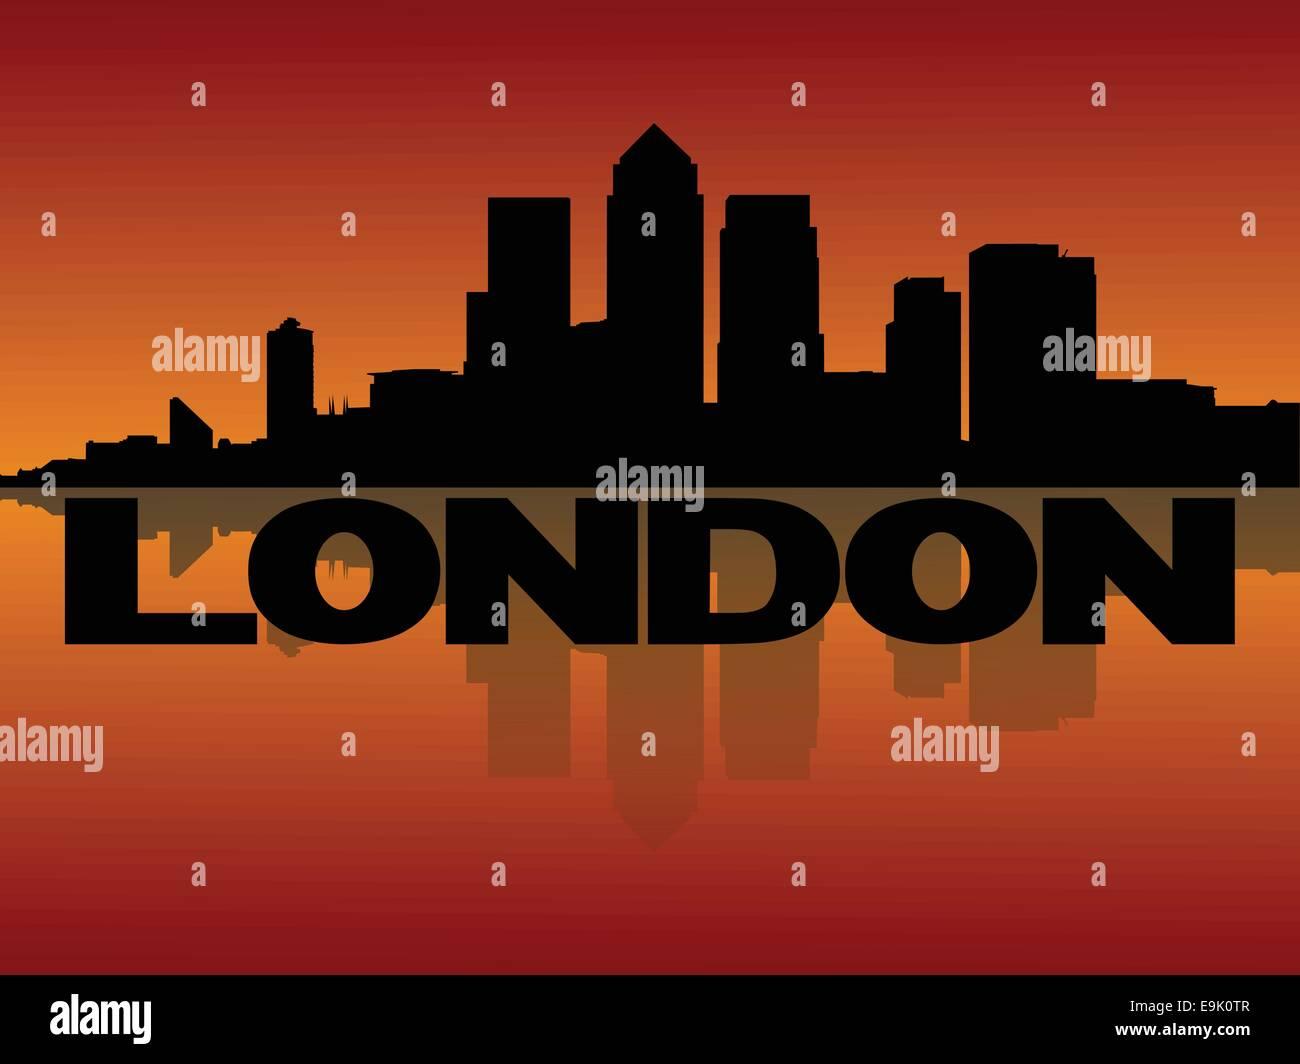 London Docklands skyline reflected at sunset vector illustration - Stock Vector